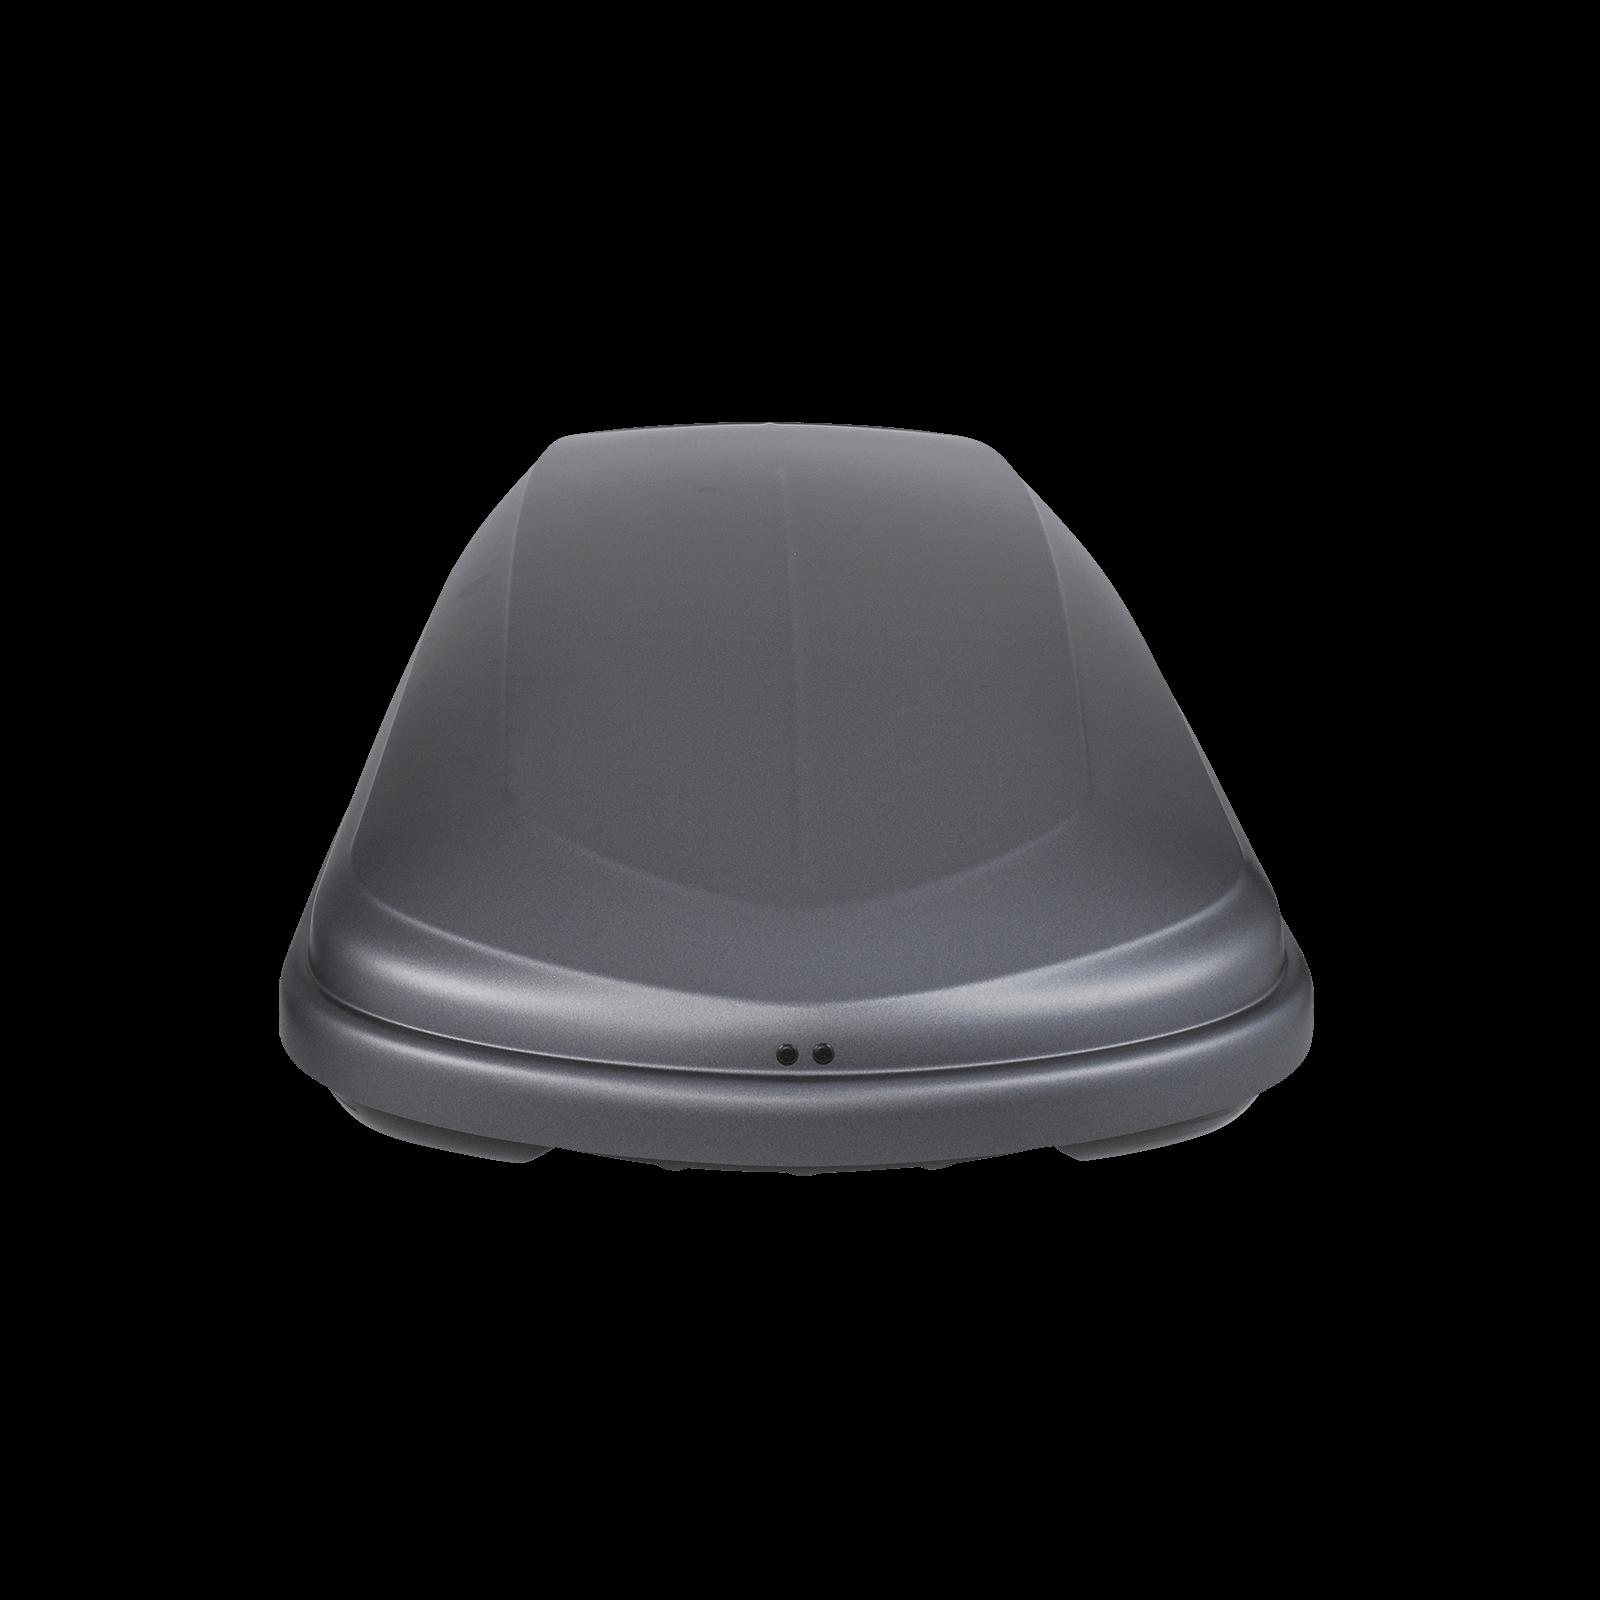 Dachbox Hapro Traxer 8.6 Titanium - Bild 3